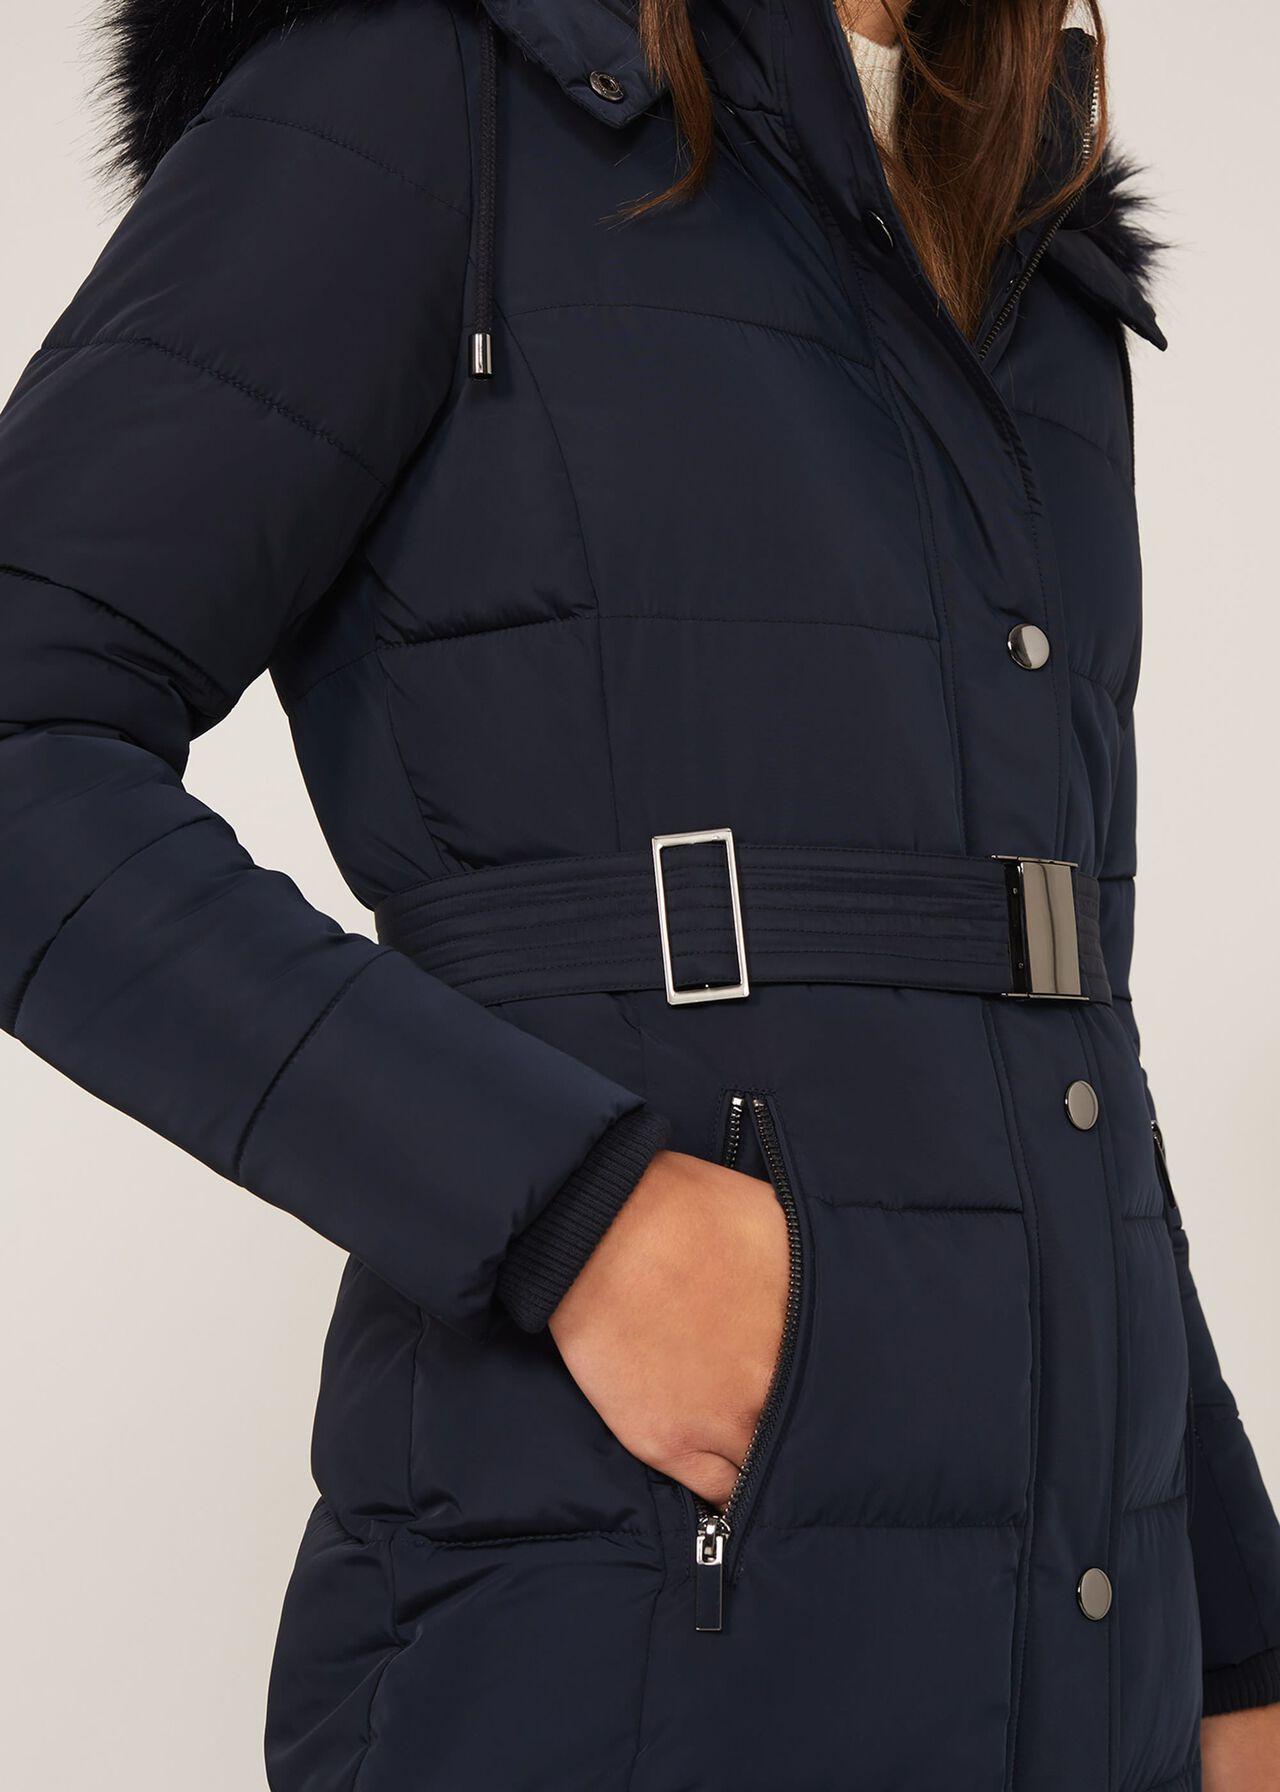 Mabel Maxi Puffer Coat